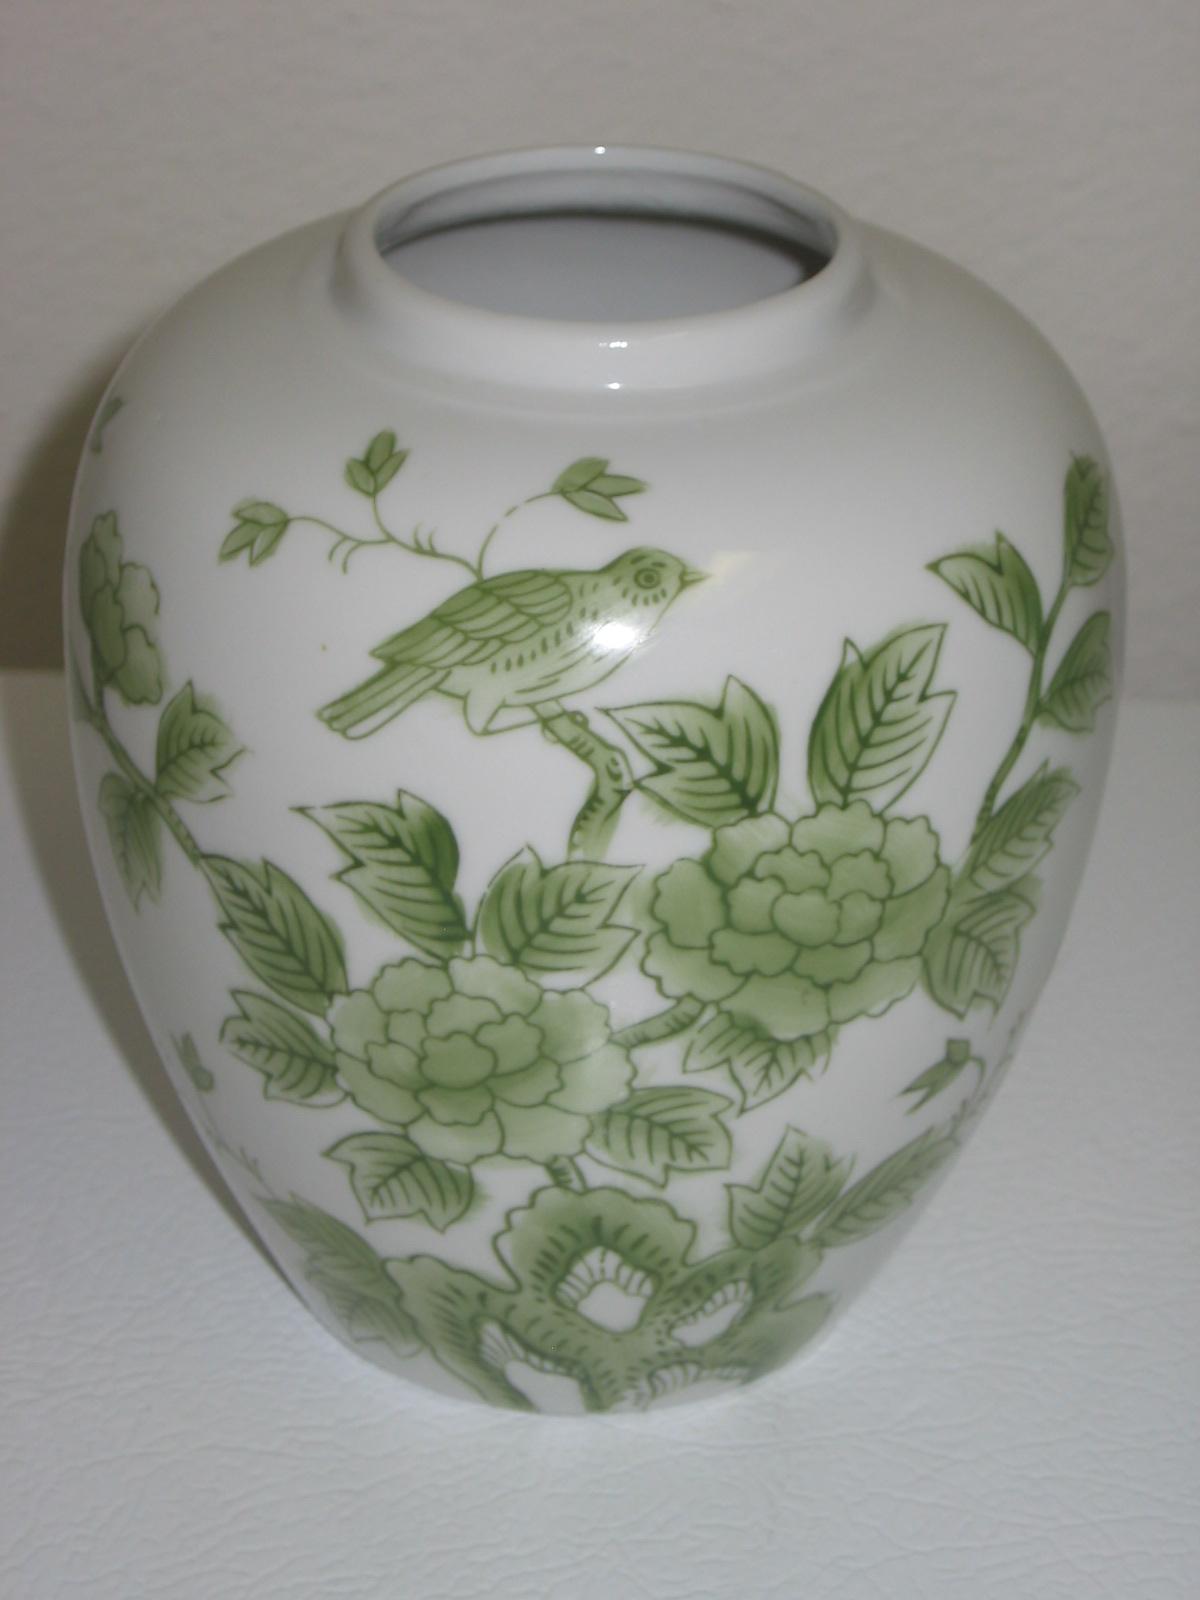 Andrea by sadek vase japan green flowers bird vases at dishway andrea by sadek vase japan green flowers bird vases at dishway to pineapplehoneys place reviewsmspy